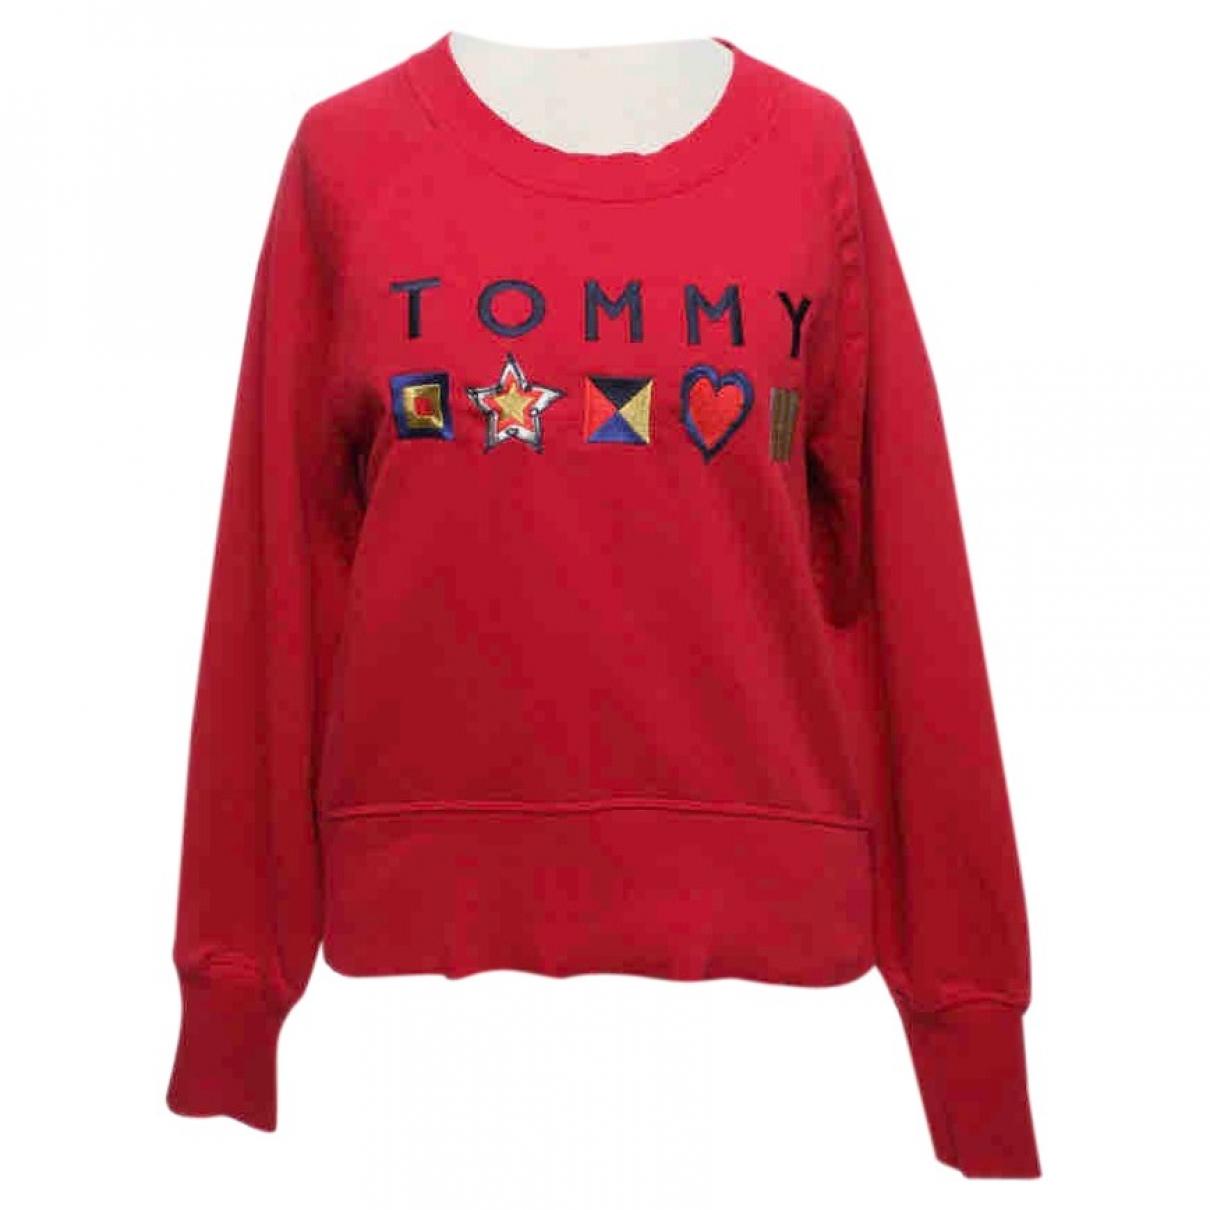 Tommy Hilfiger \N Multicolour Cotton Knitwear for Women XS International